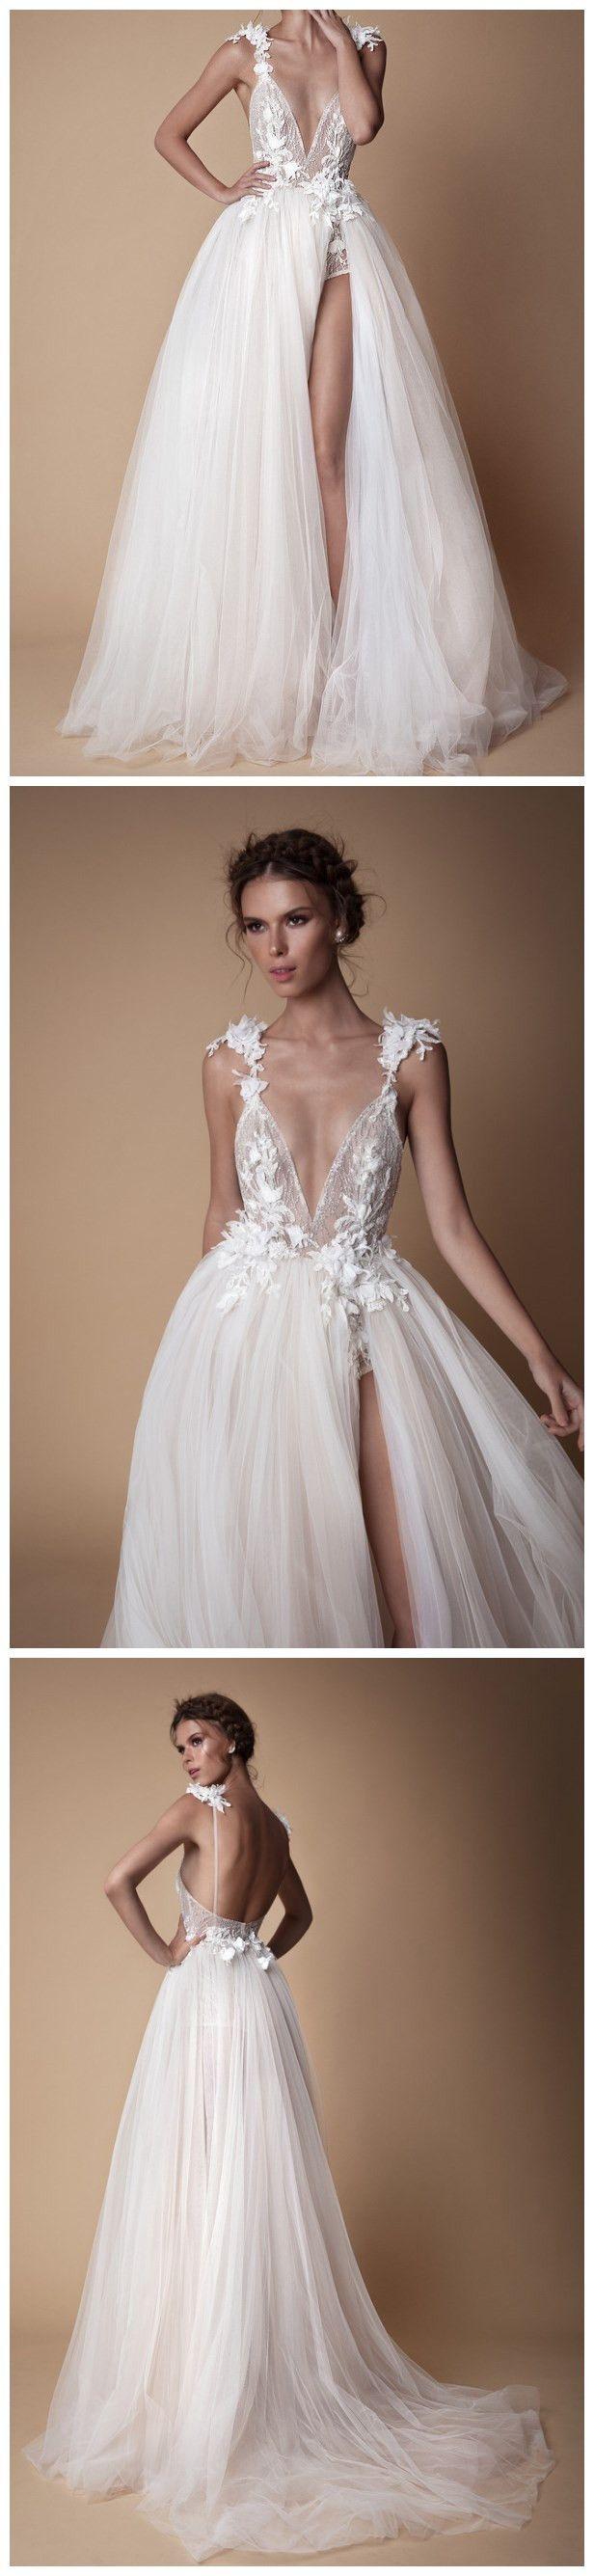 Chic deep v neck prom dress aline tulle lace elegant prom dresses